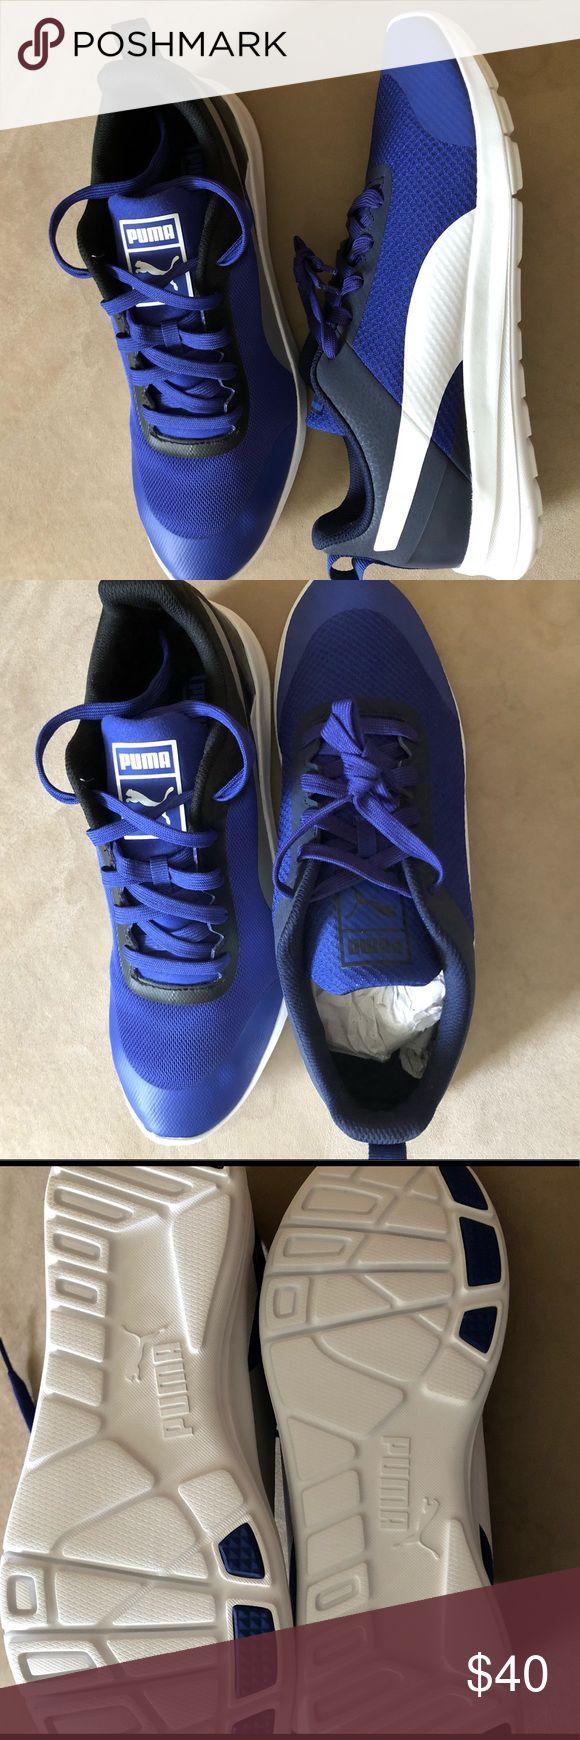 New Puma Sneakers for Men New puma sneaker Size: 9.5 Perfect colors  No box Puma Puma Shoes Sneakers